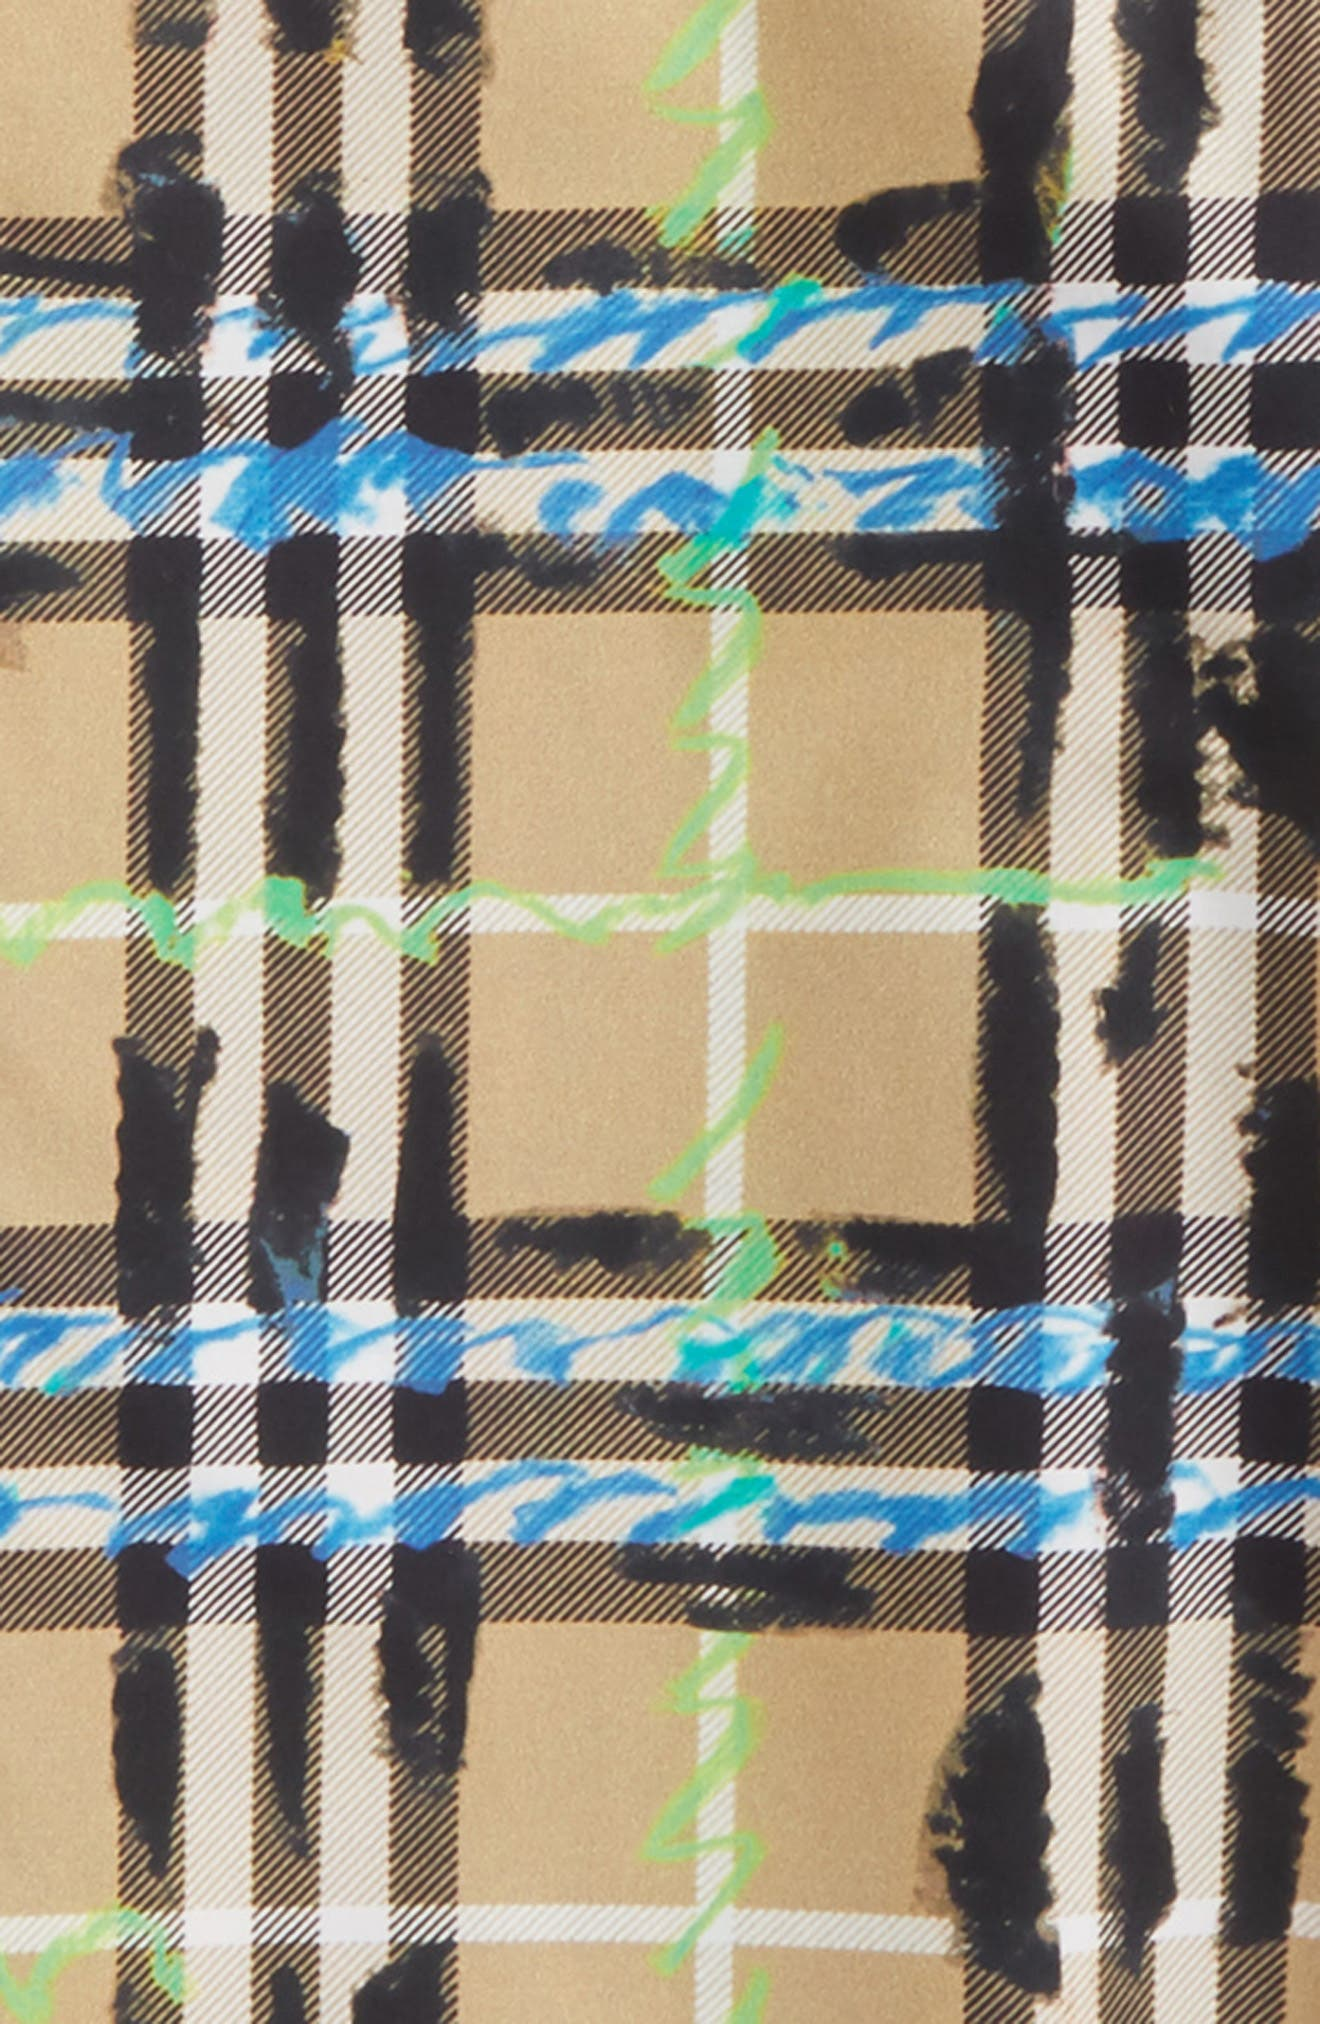 Clarkey Scribble Check Woven Shirt,                             Alternate thumbnail 2, color,                             BRIGHT BLUE